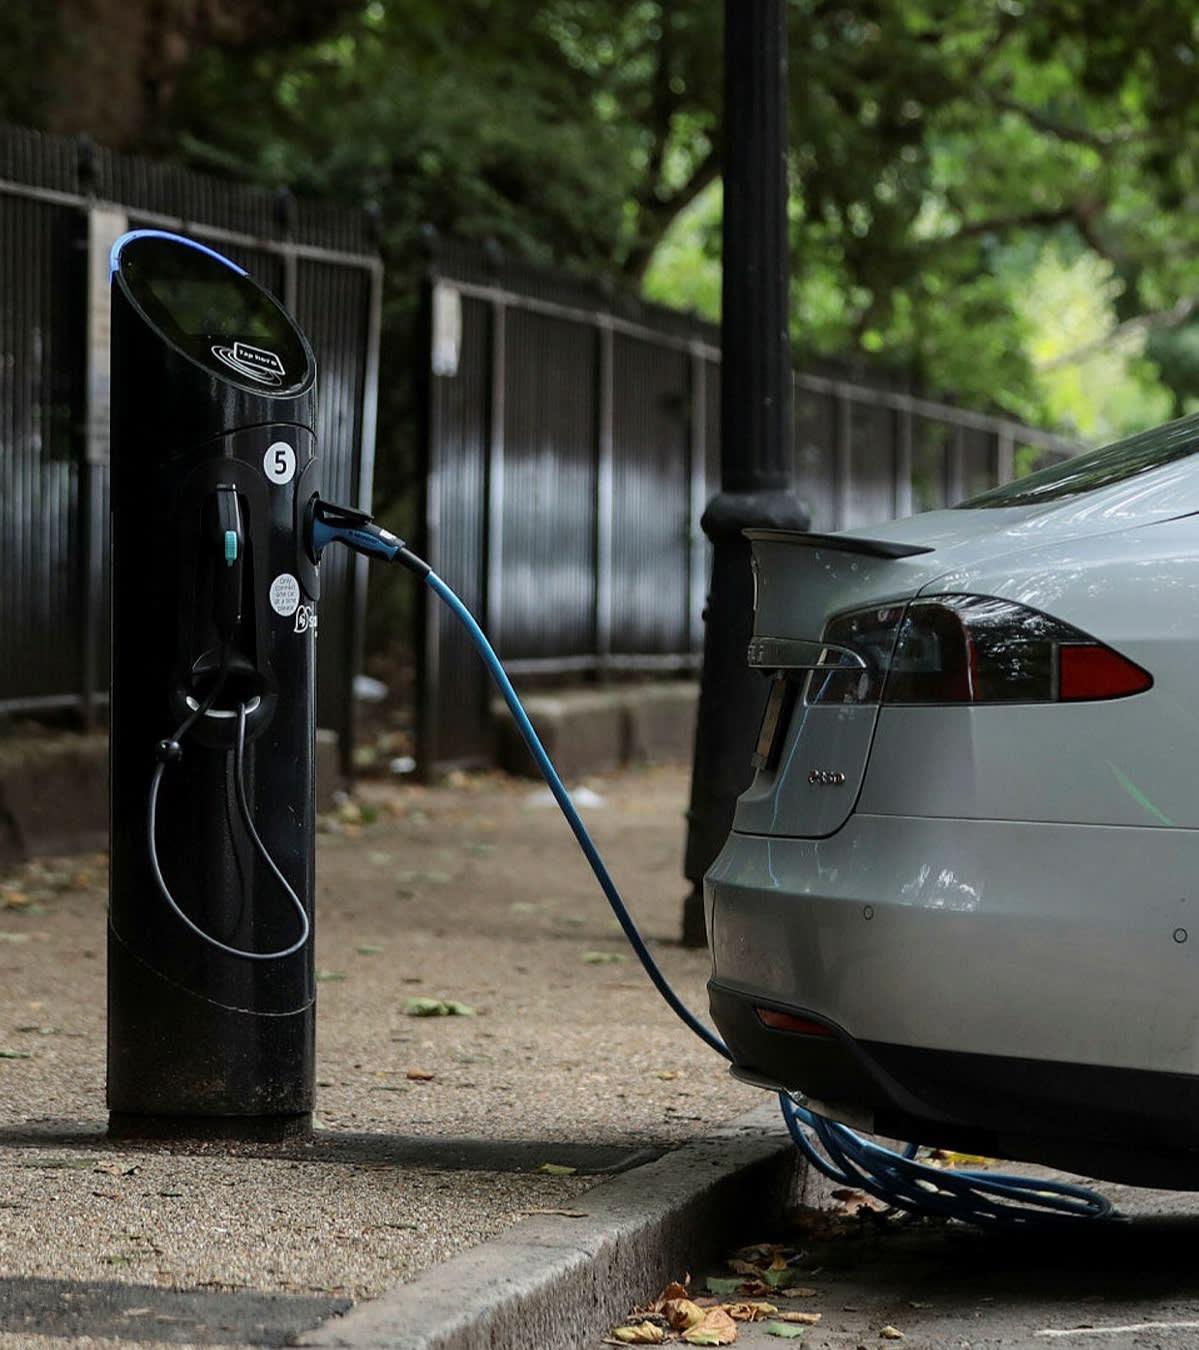 EV street charging